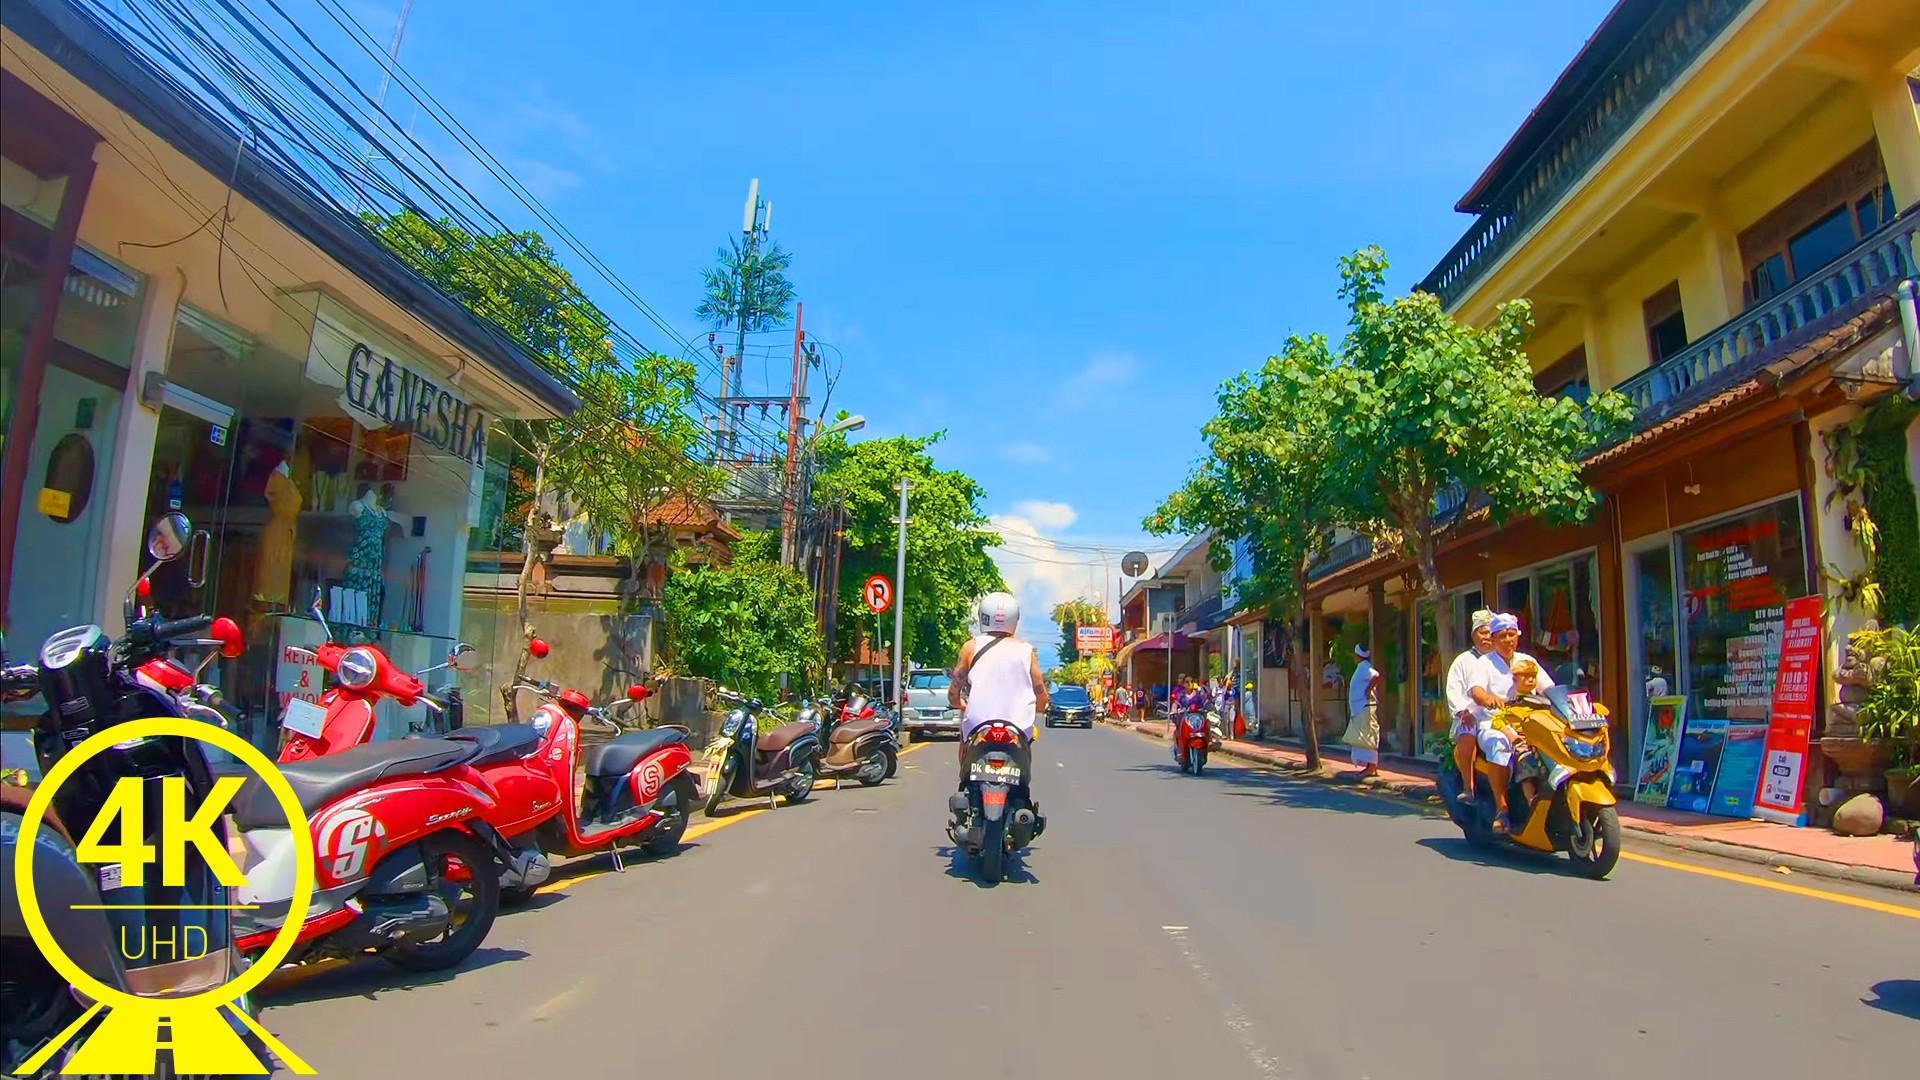 Roads of Bali, Indonesia PART 1